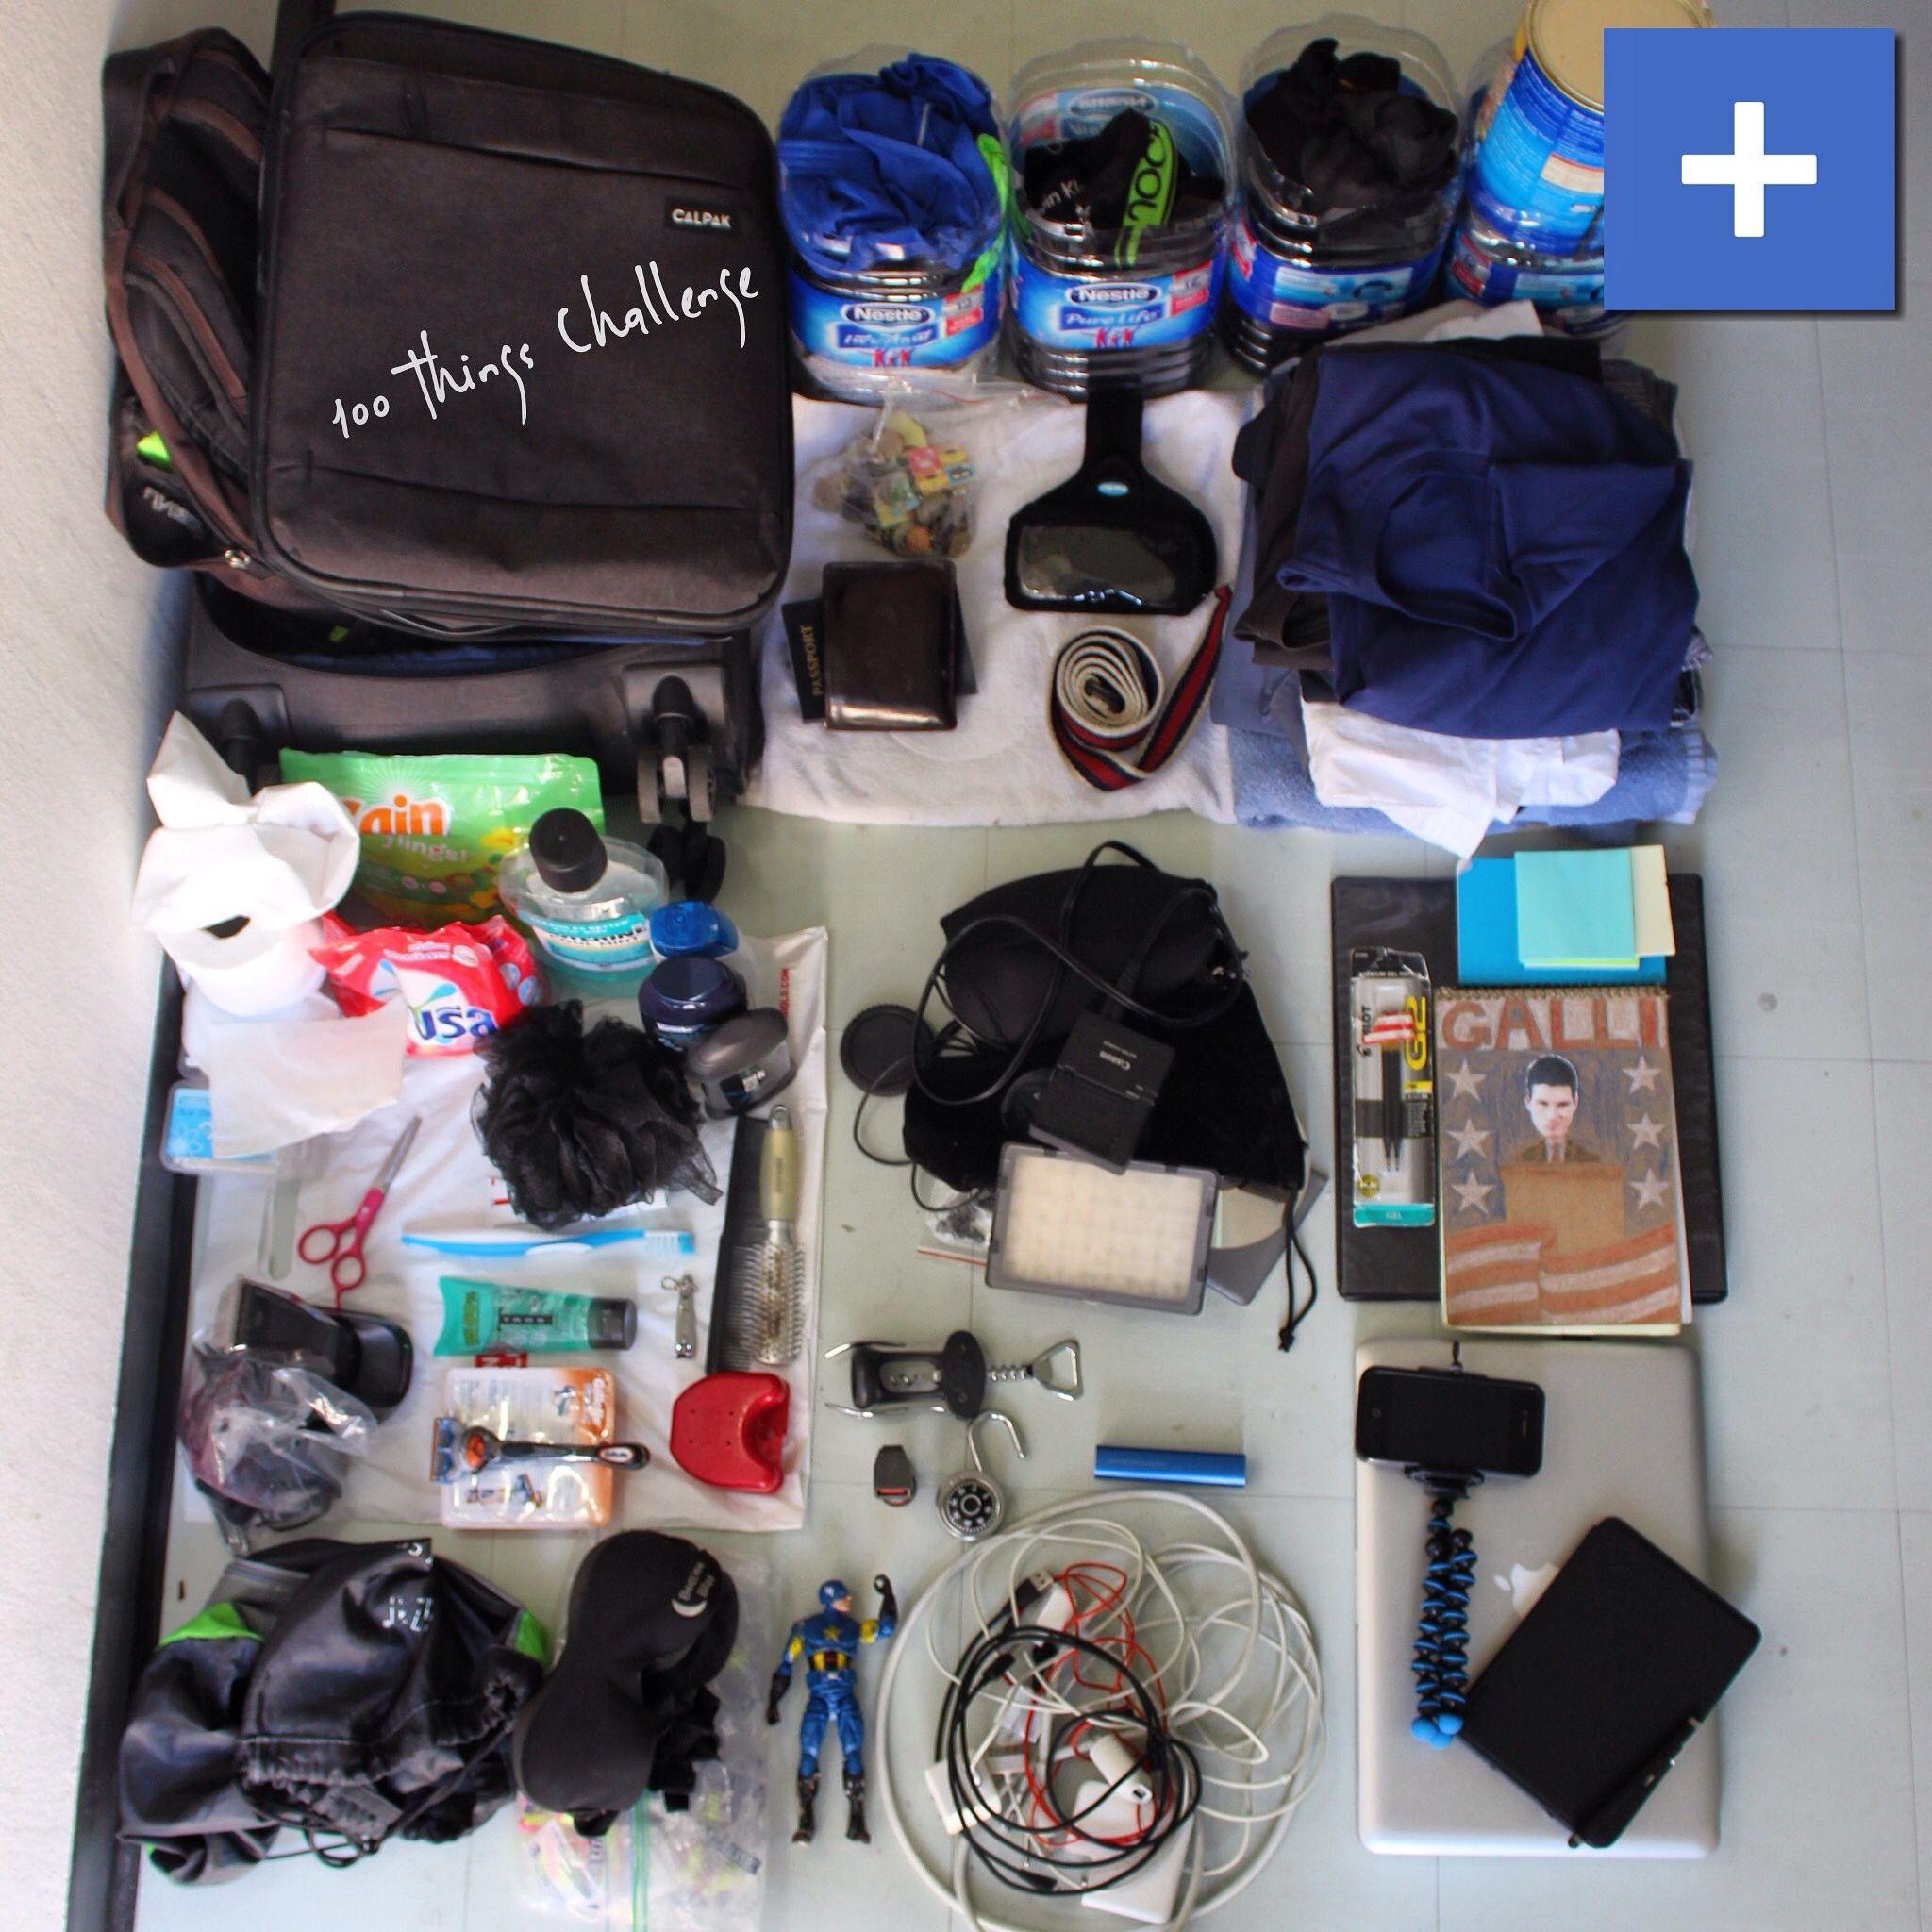 Start 100 Things Challenge